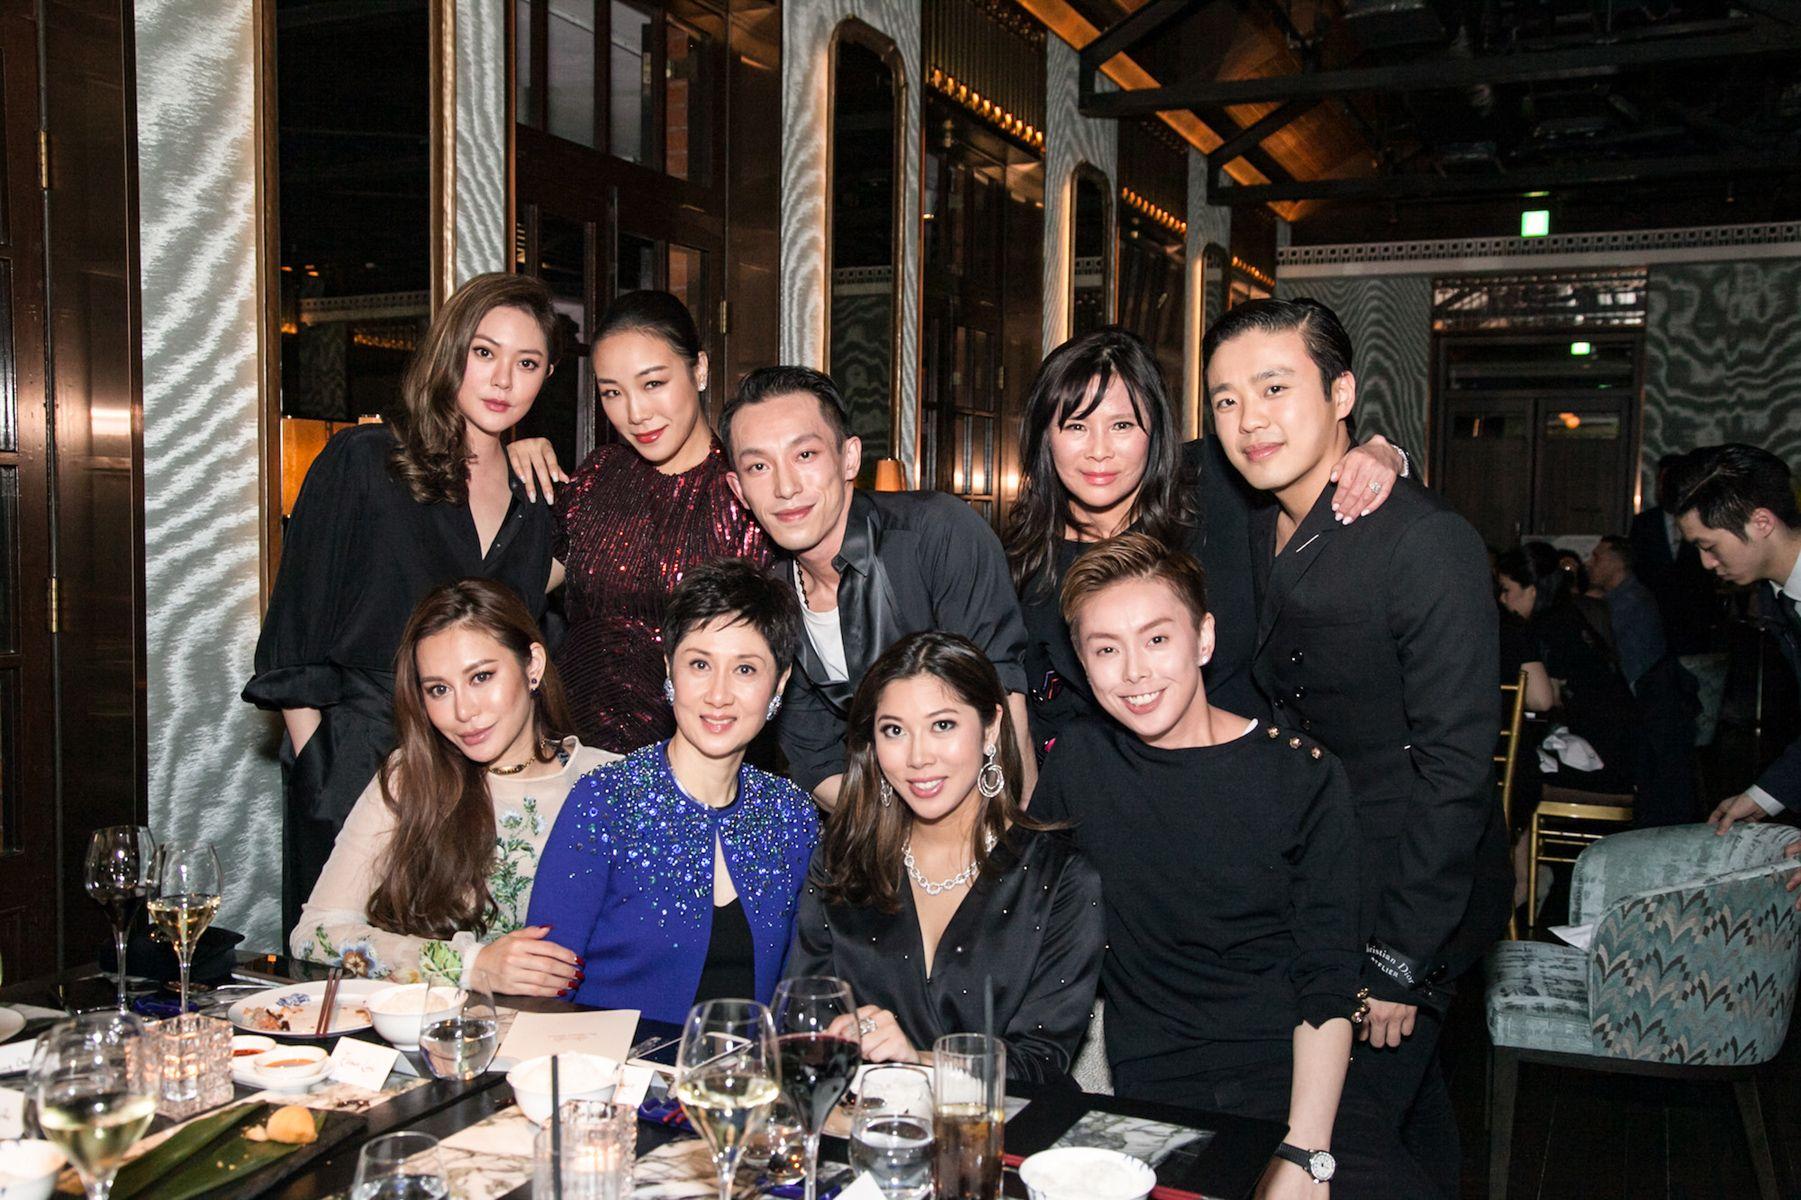 Standing - René Chu, Feiping Chang, Harris Chan, Yvette Yung, Jonathan Cheung. Seated - Eleanor Lam, Michelle Ong, Amanda Cheung, Tiffany Chan